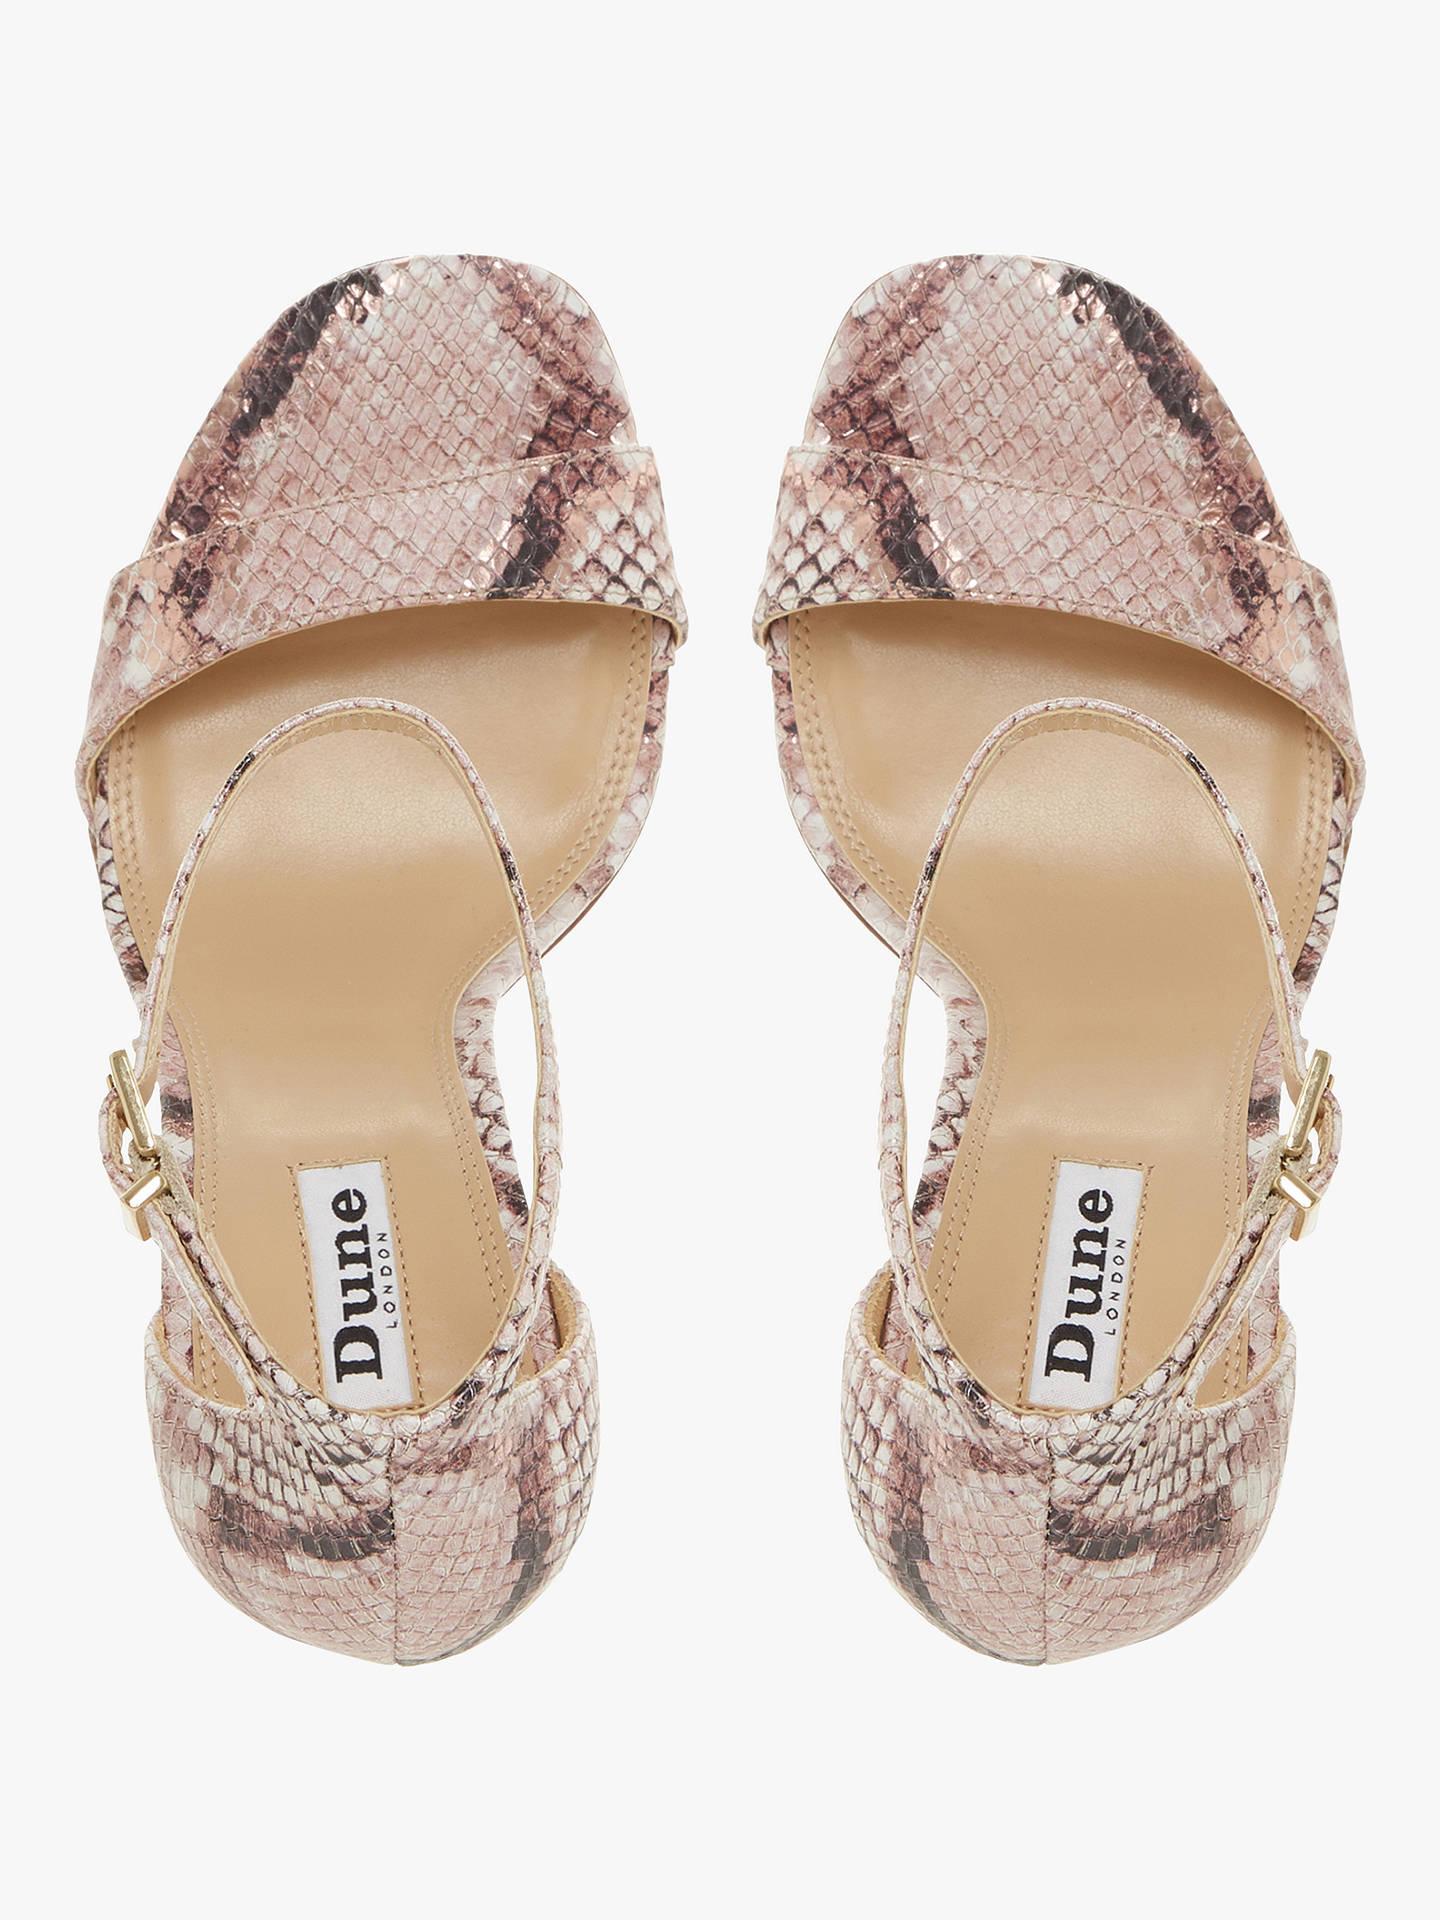 b5d798d934a3 ... Buy Dune Moxie Stiletto Heel Sandals